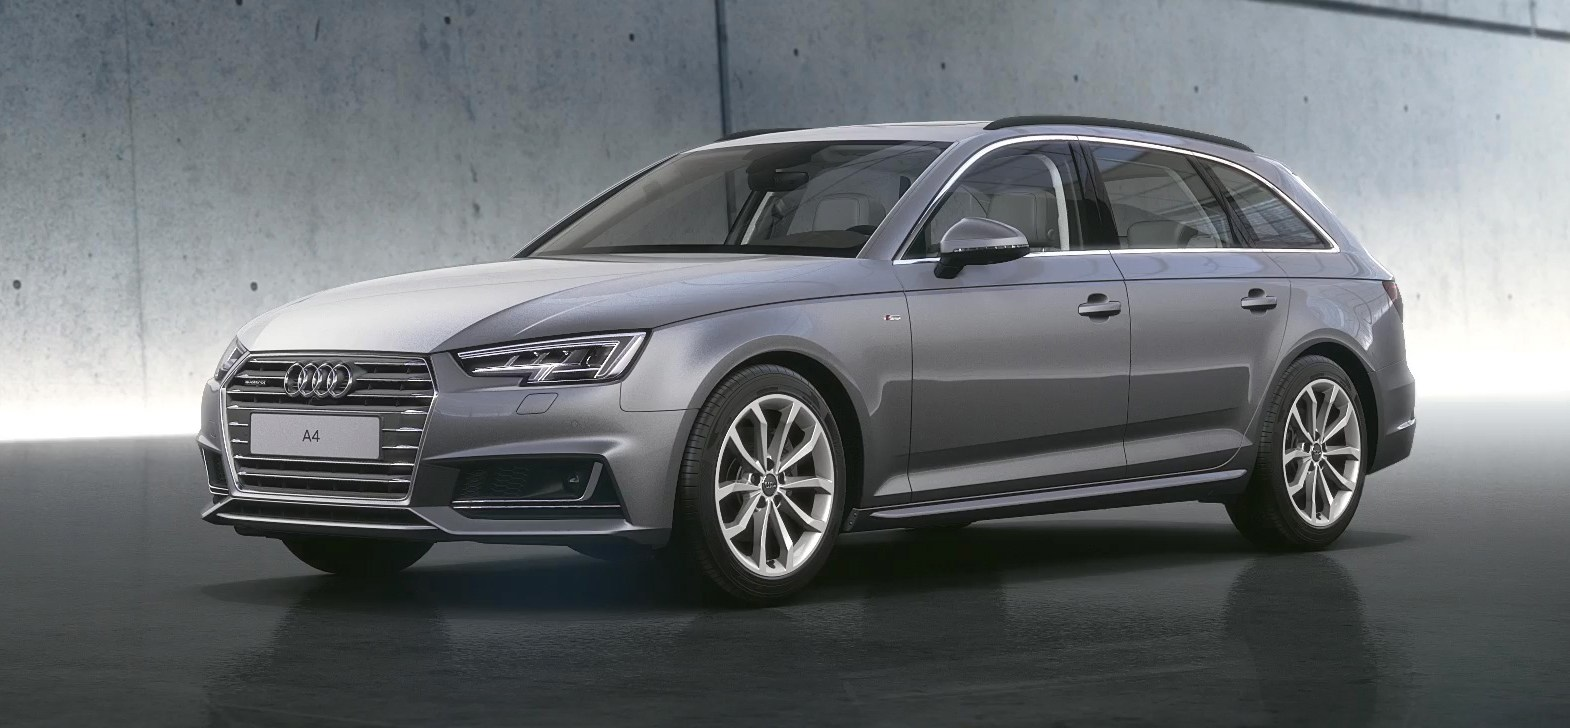 Noleggio a lungo termine: avere una Audi in garage…